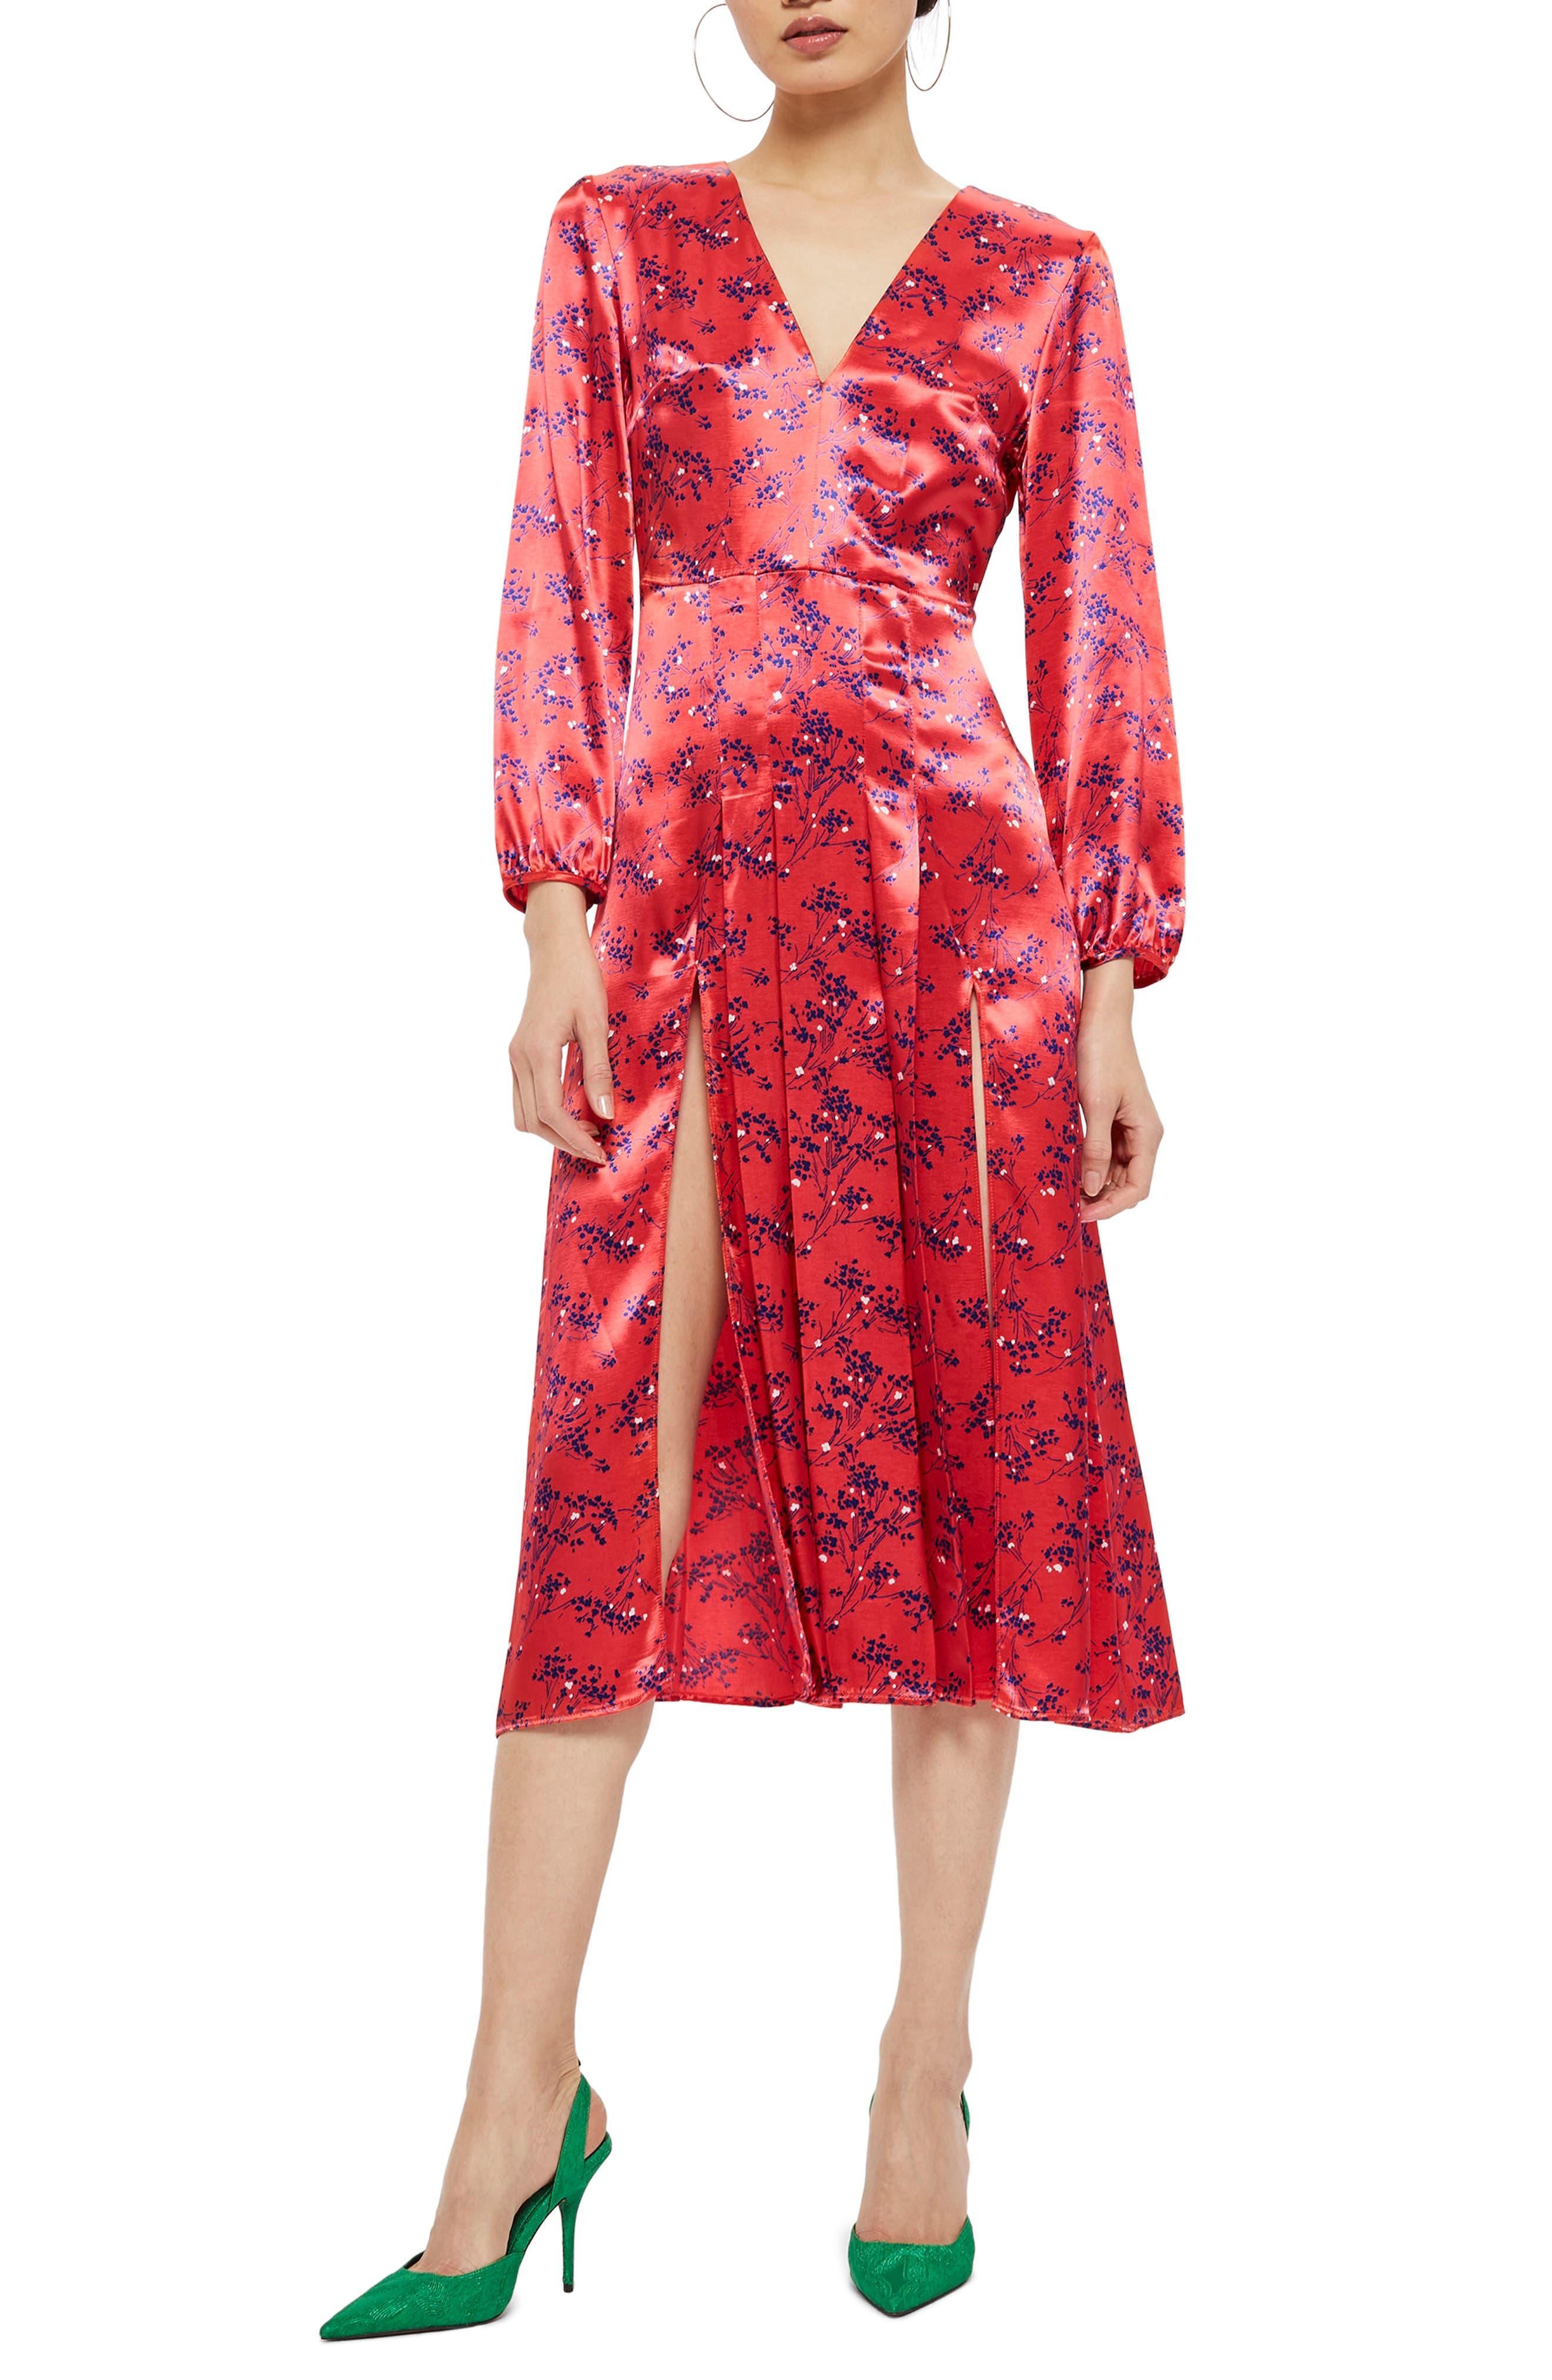 Wispy Floral Print Midi Dress,                             Main thumbnail 1, color,                             600